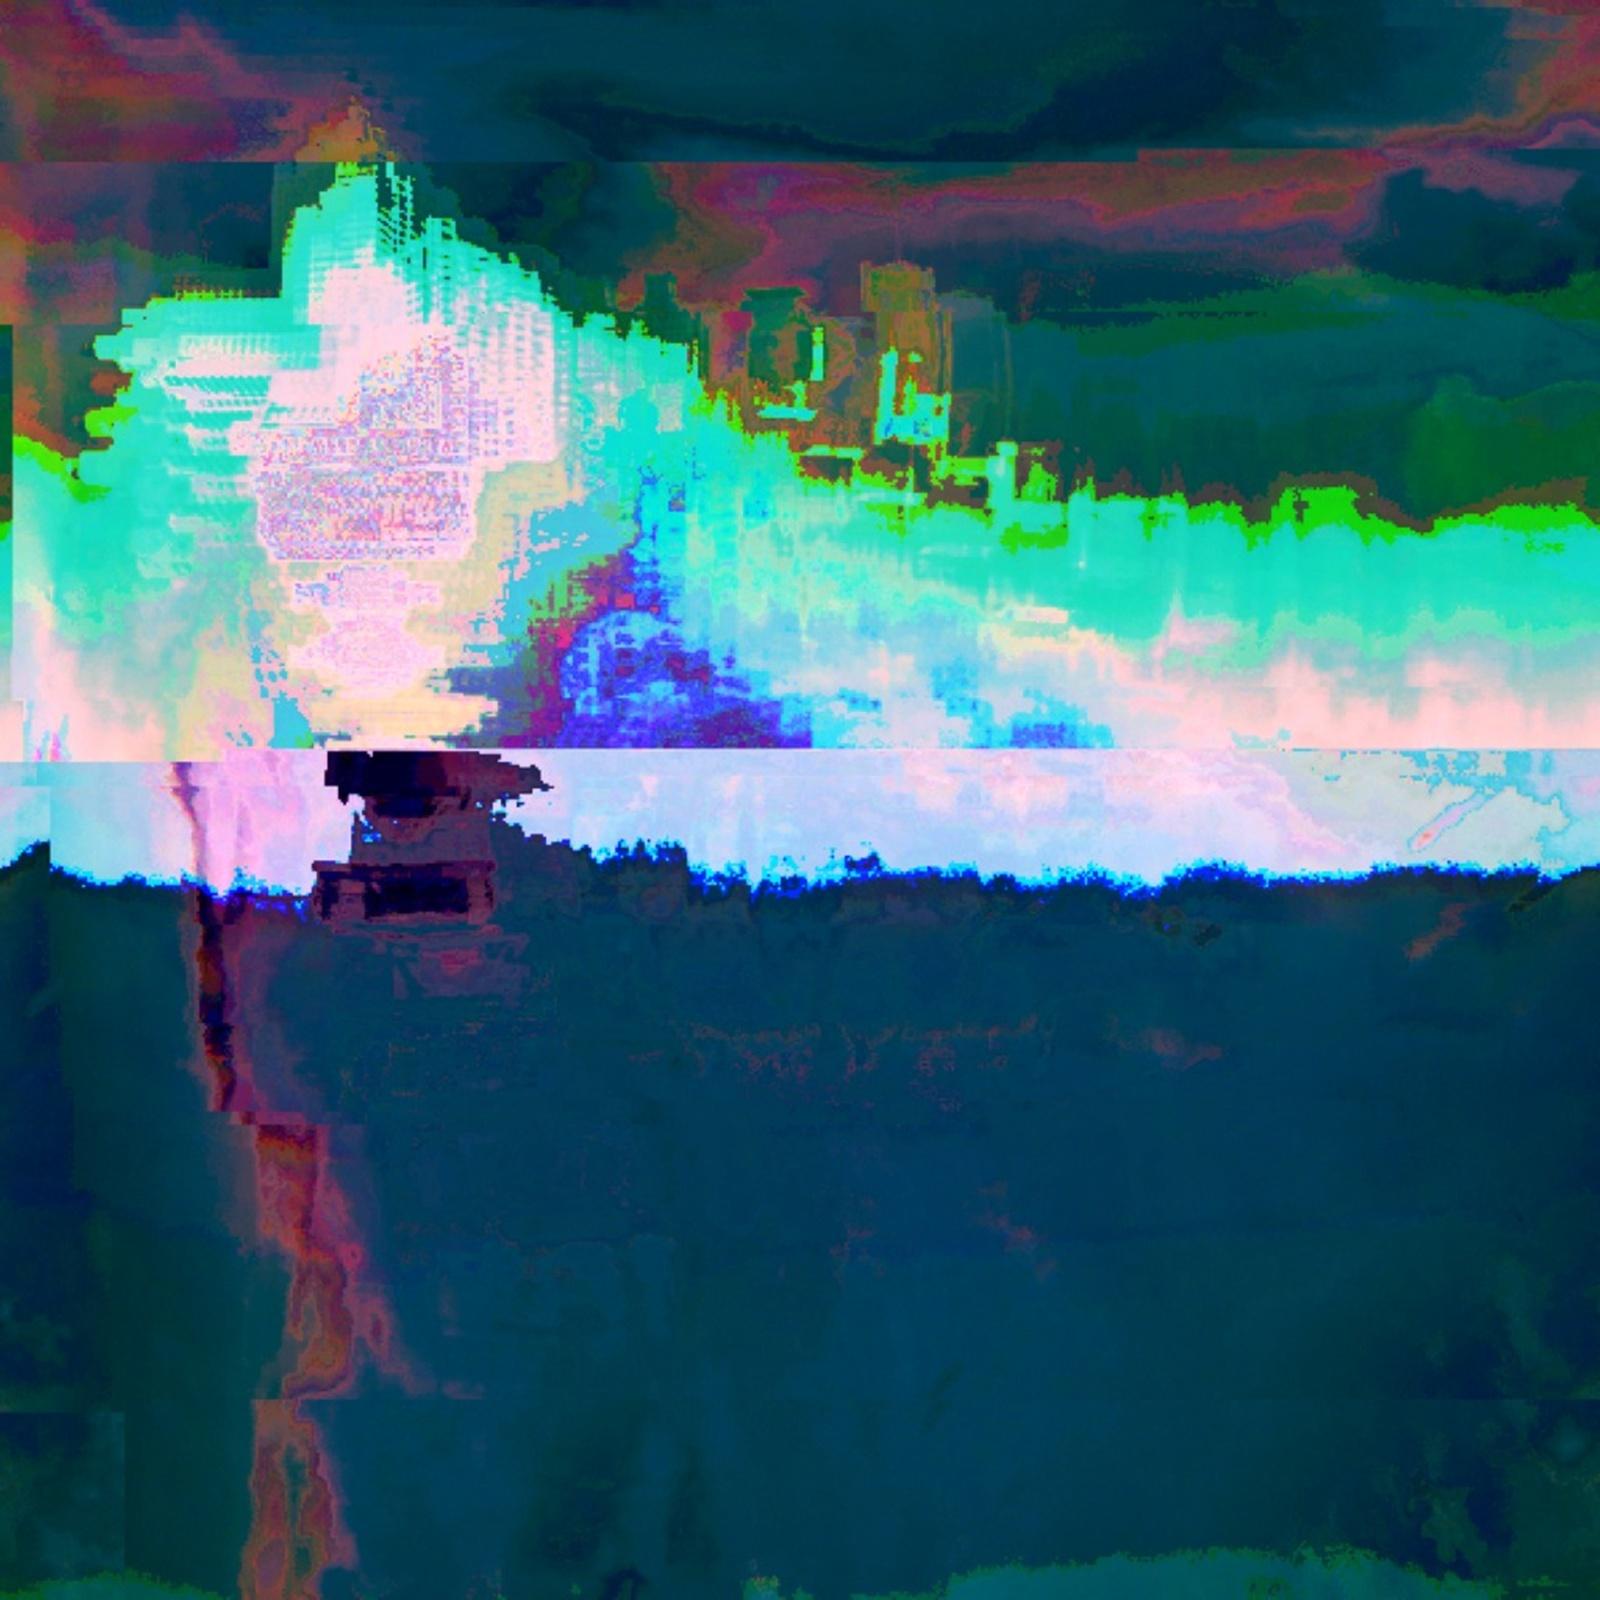 162653-8400049-Building_cloud_reflect_glitch.jpg